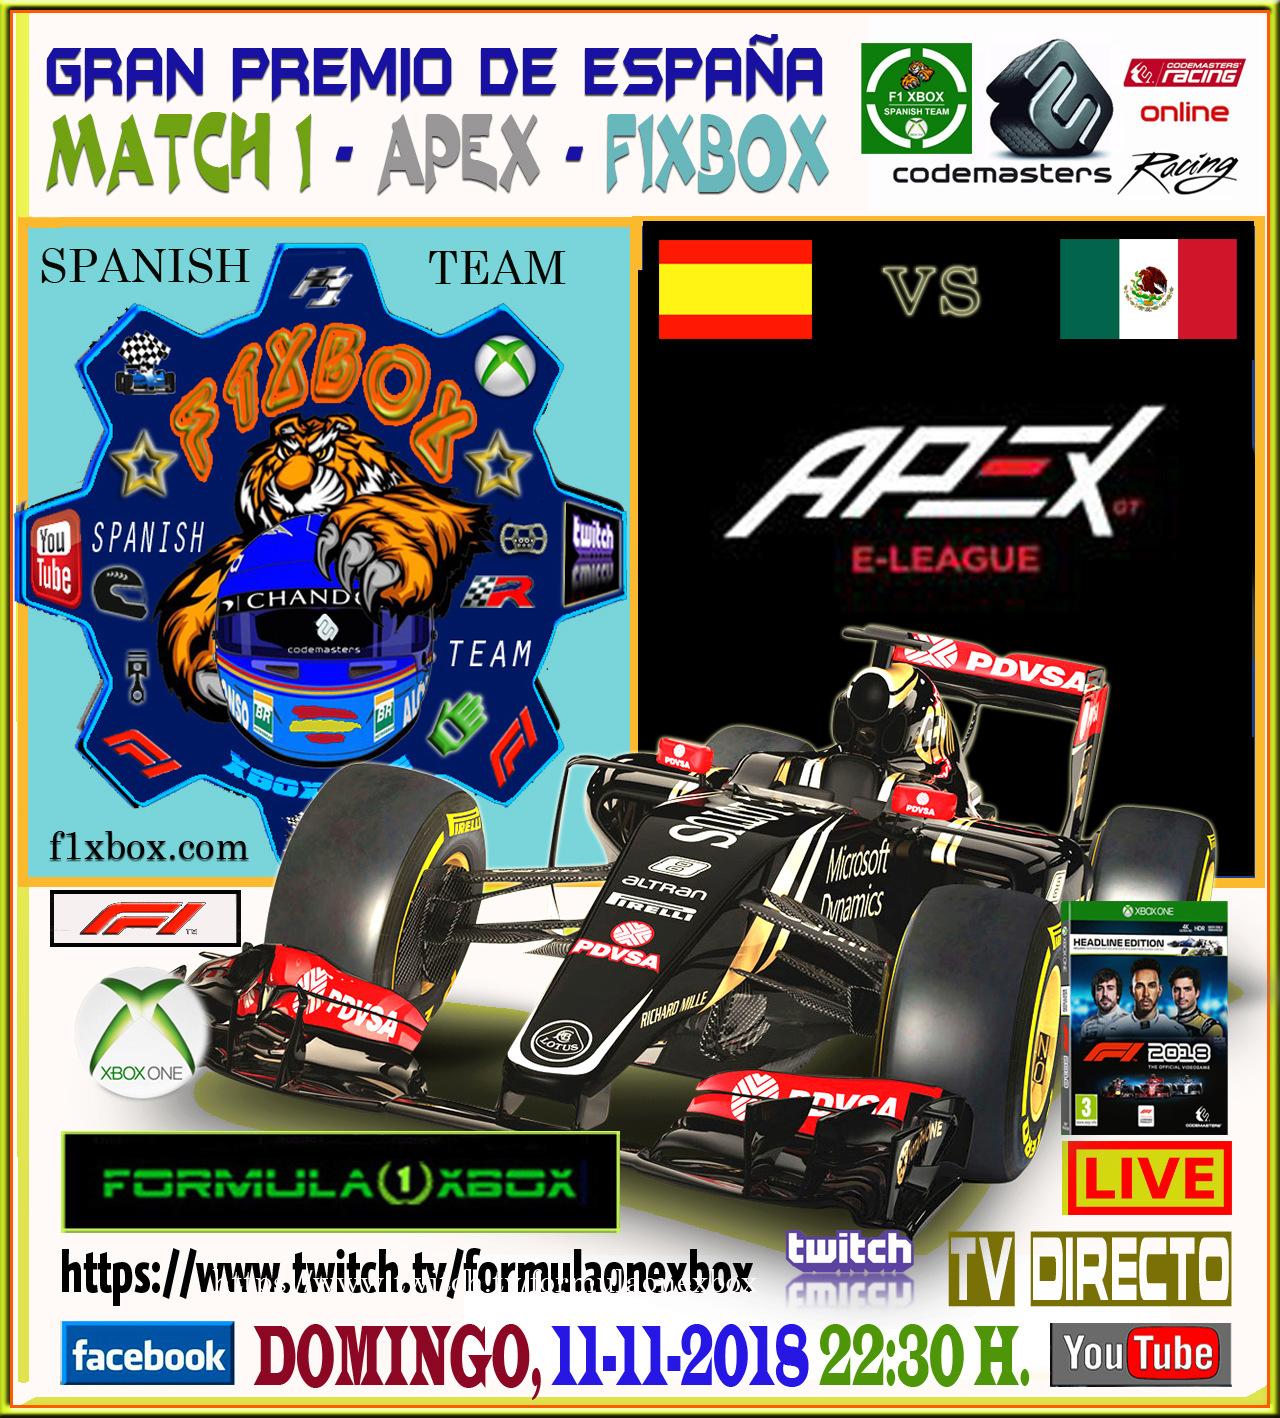 F1 2018 . XBOX ONE *** CARRERA INTERFOROS APEX vs F1 XBOX *** DOMINGO 11 - 11 - 2018 A LAS 22:00 H. *** GP DE ESPAÑA AL 50 *** Cabece28